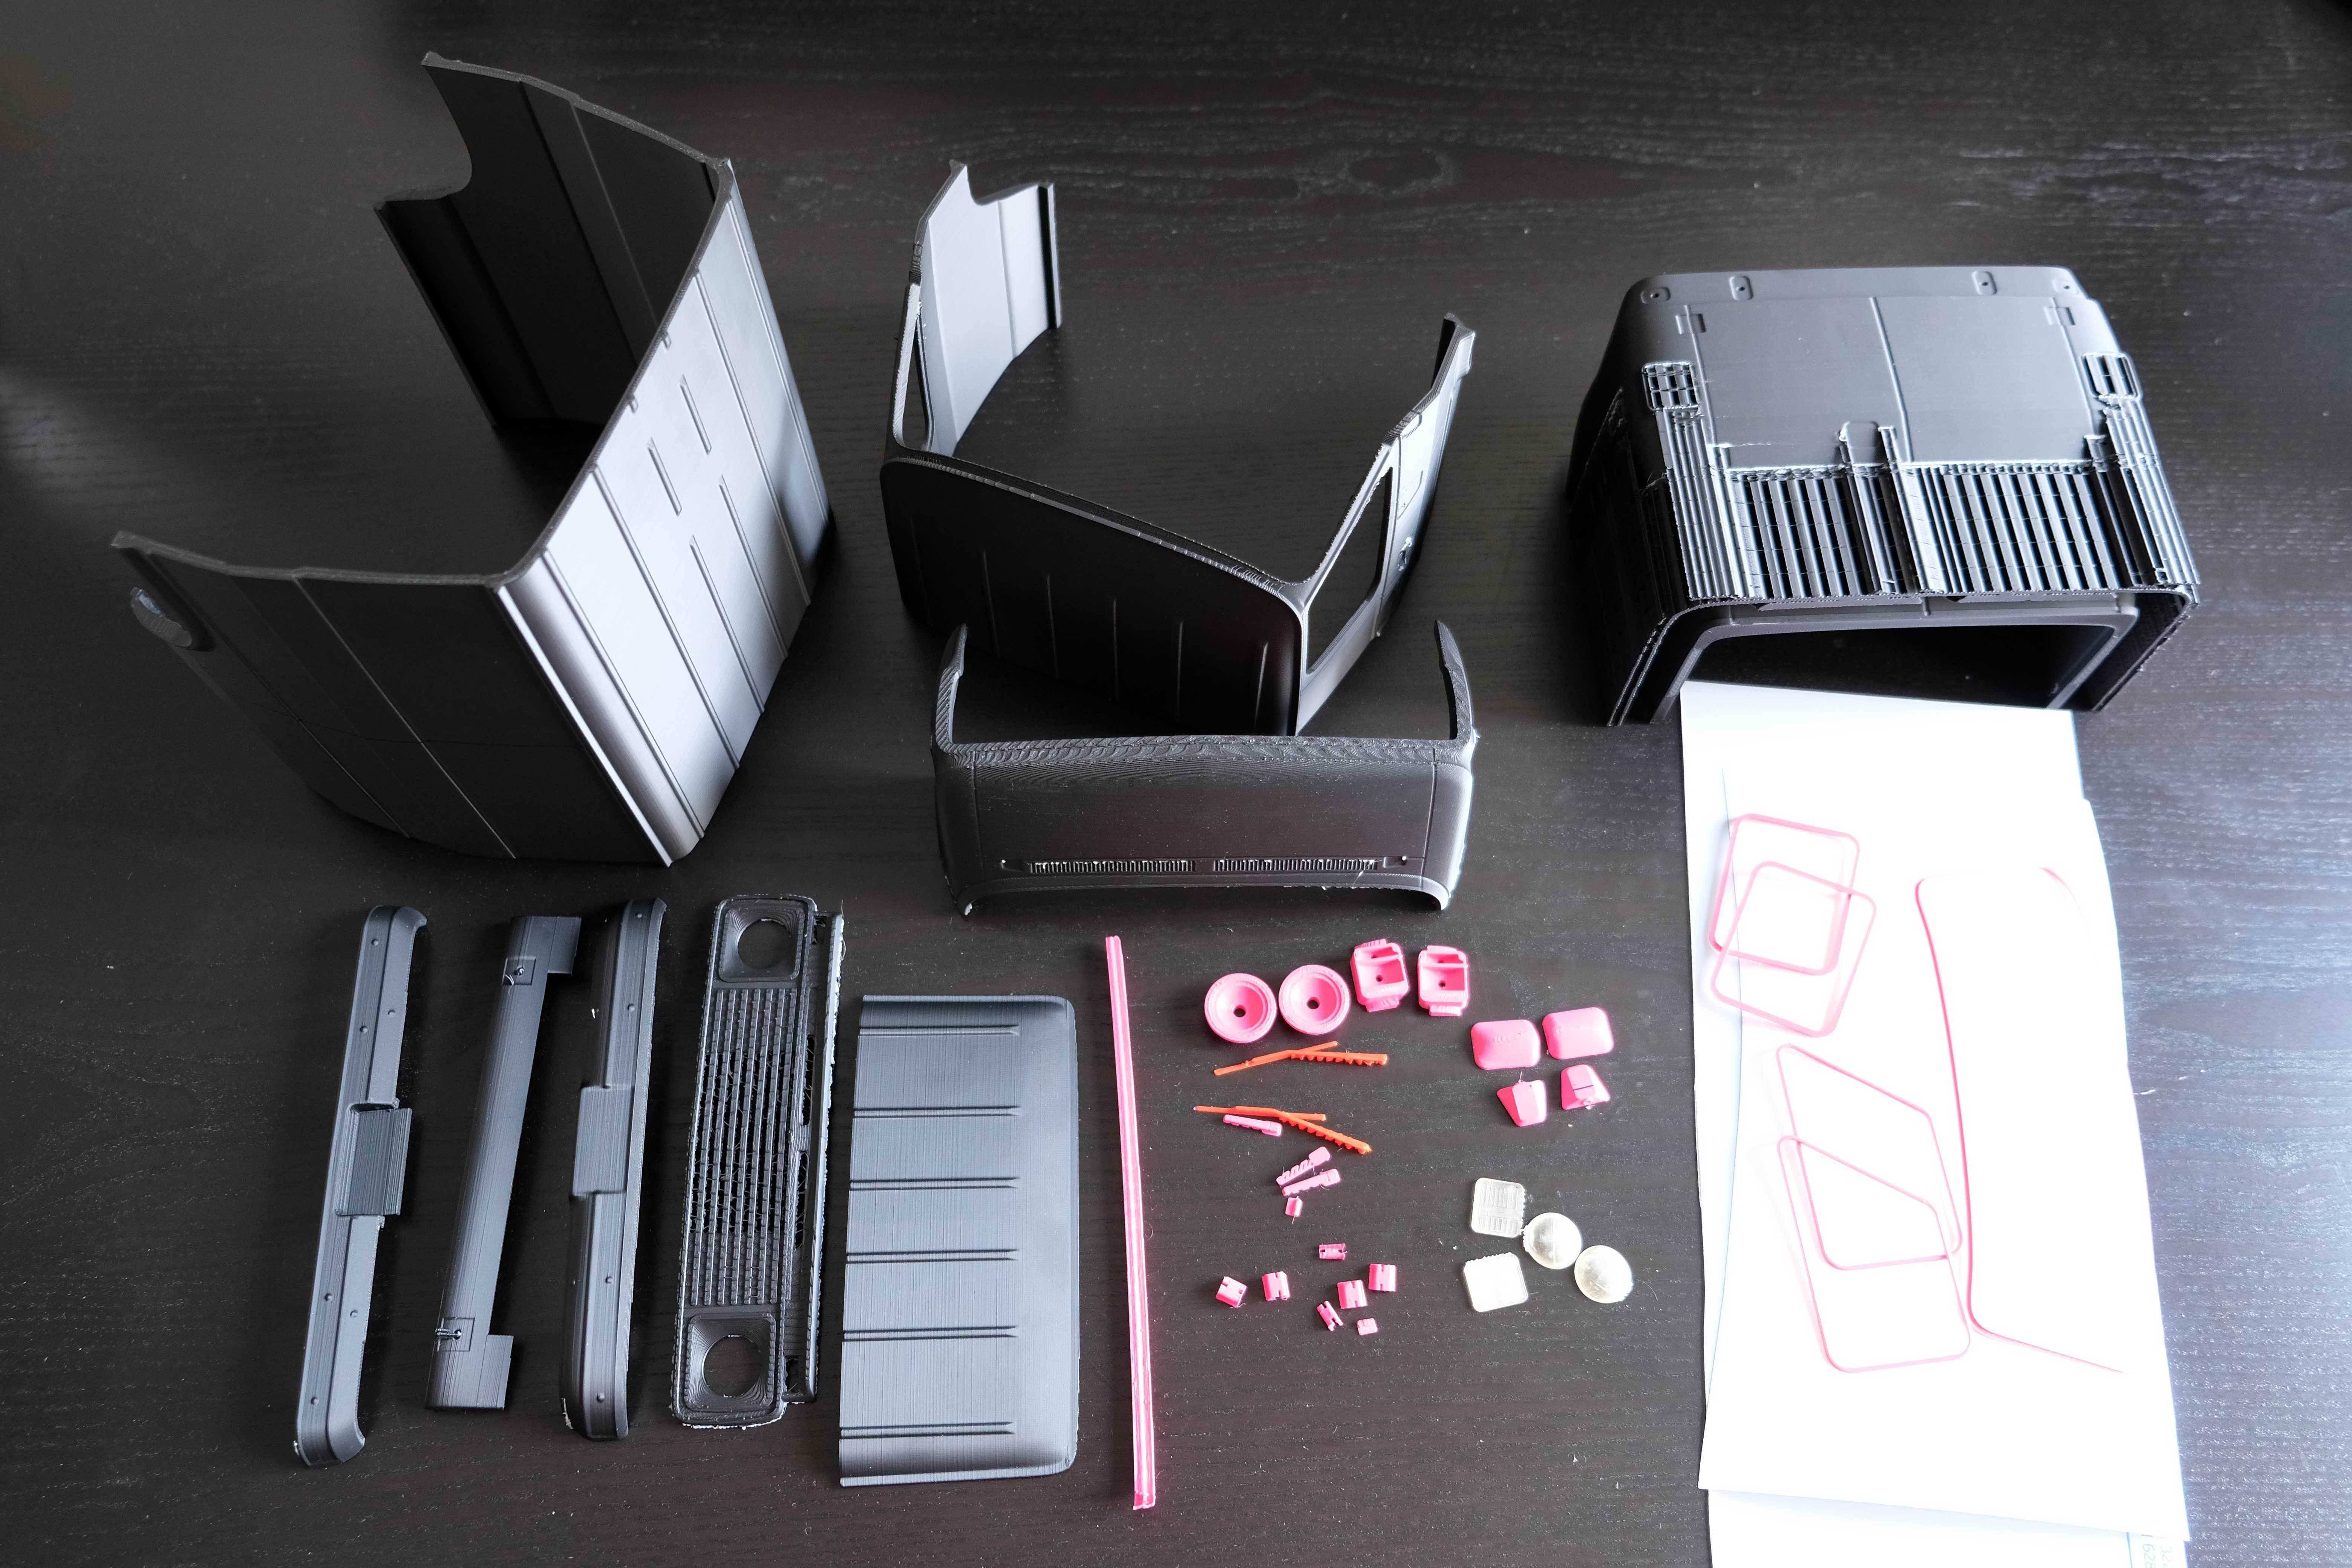 chevy-van-g20-3d-printed-6.jpg Descargar archivo STL CHEVY VAN G20 RC BODY SCALER AXIAL MST TRX4 RC4WD • Modelo para imprimir en 3D, ilyakapitonov